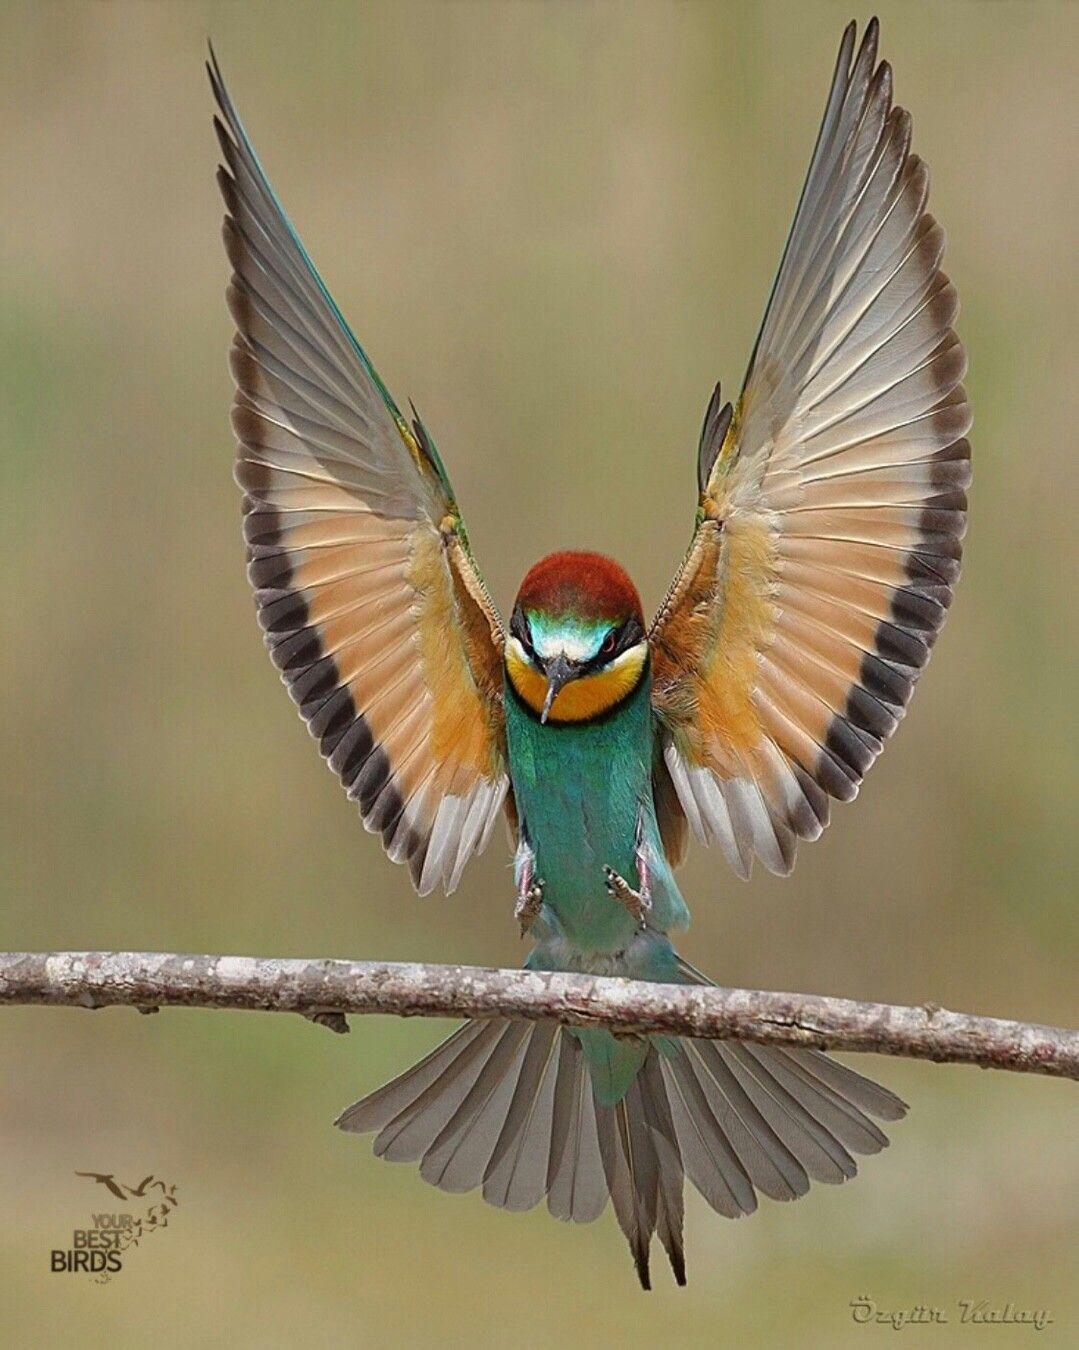 Ozgurkalay80 Bird Of The Day Bee Eater Location Turkey Bird Pictures Birds Flying Bird Photography